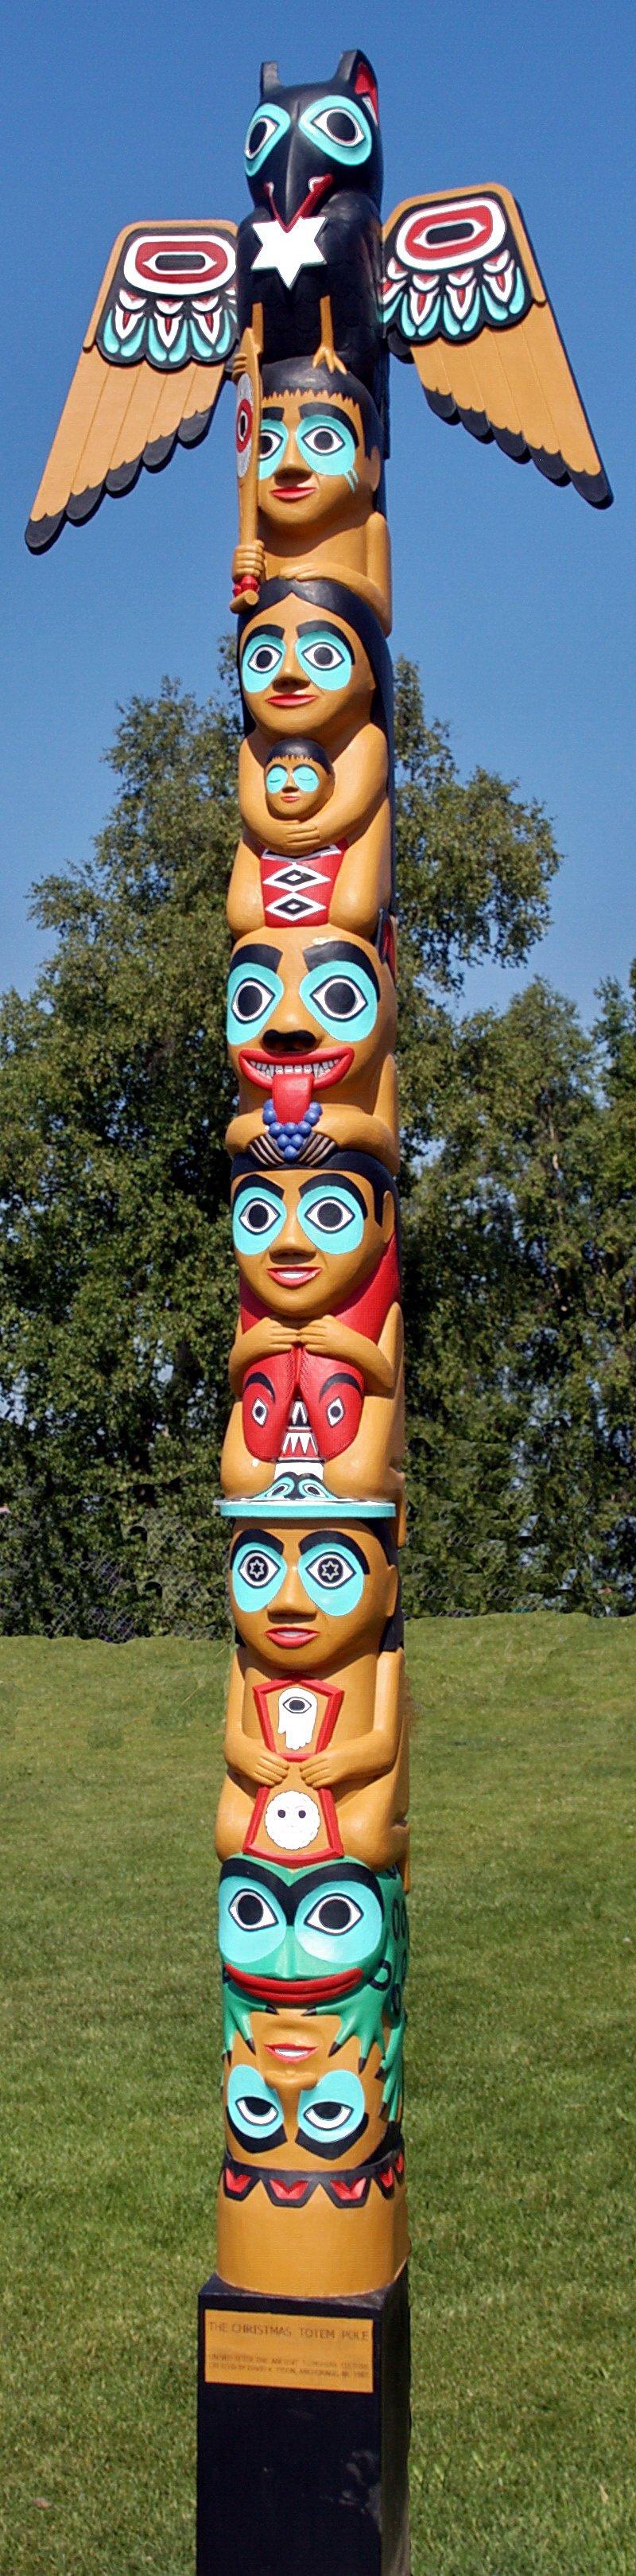 Totem Pole clipart tlingit indians David K K Pinterest Fison